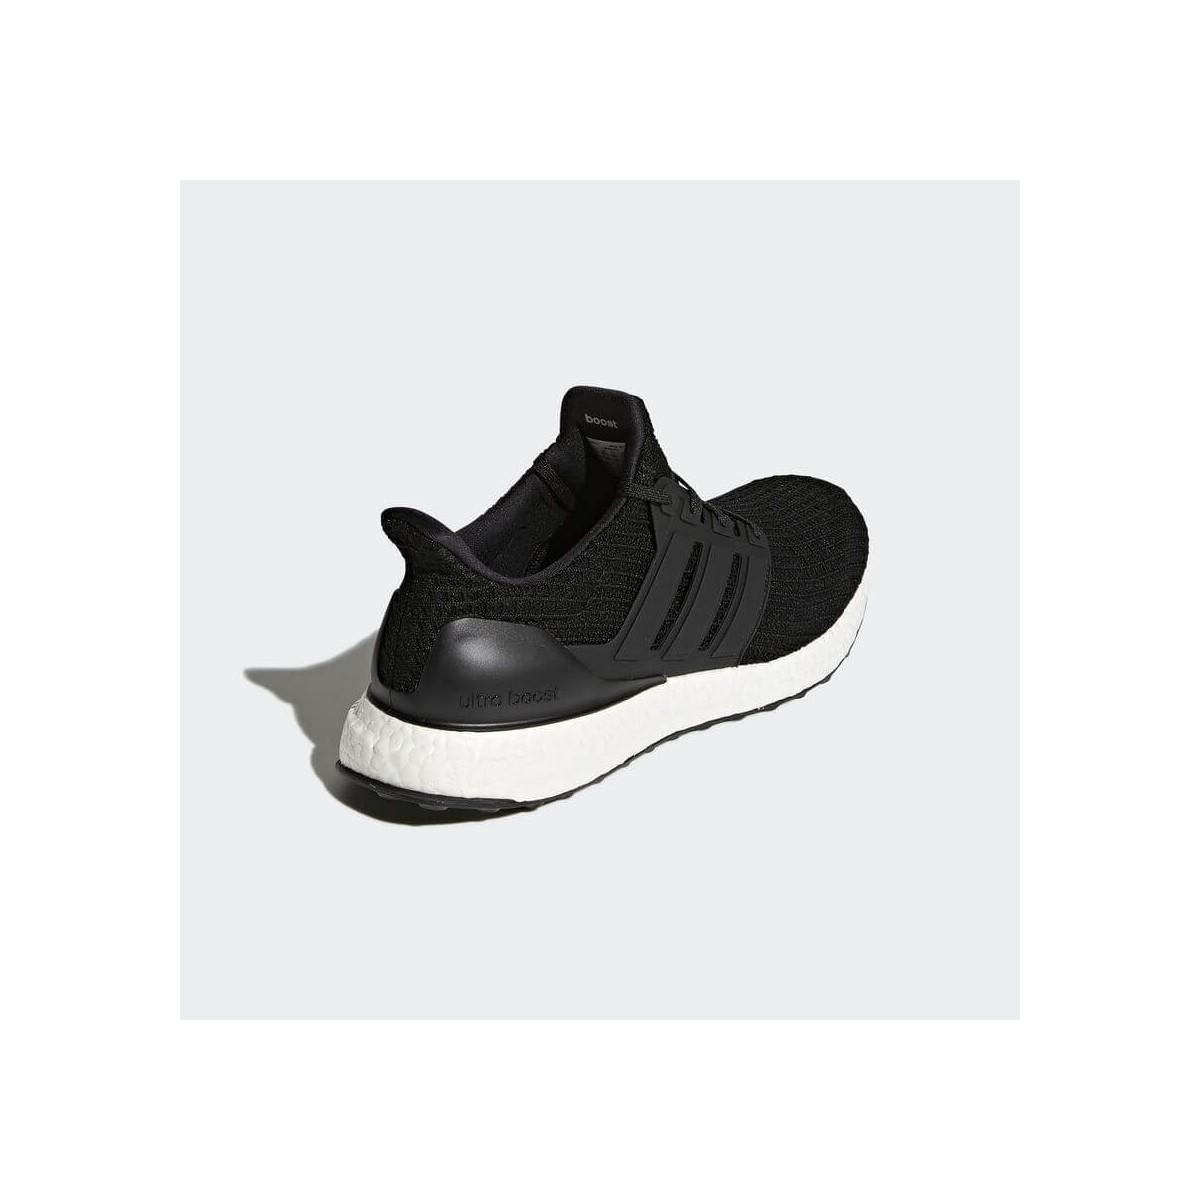 official photos 22446 20924 ... Adidas Ultra Boost Negro Hombre PV18 ...